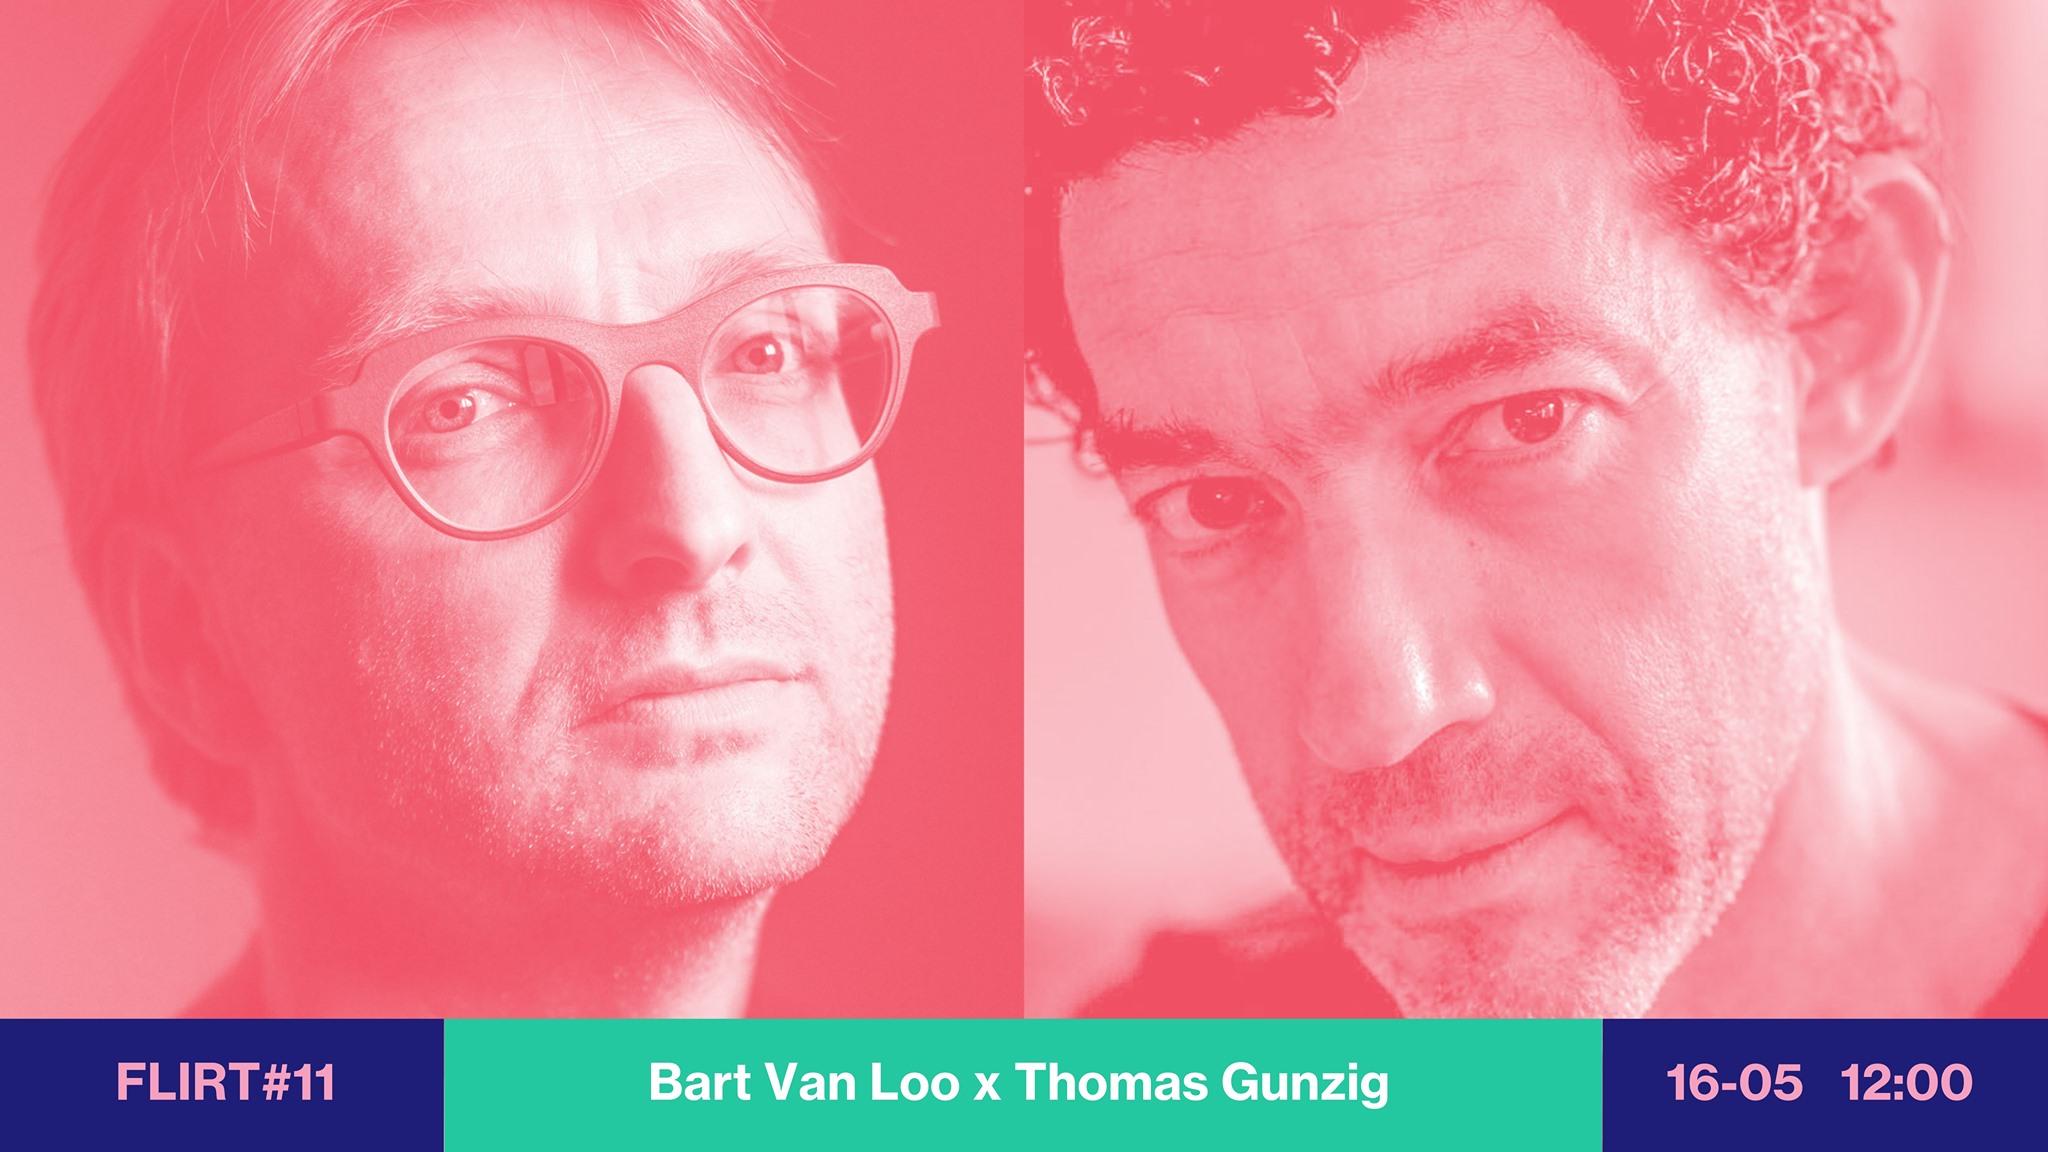 FLIRT #11 Bart Van Loo & Thomas Gunzig